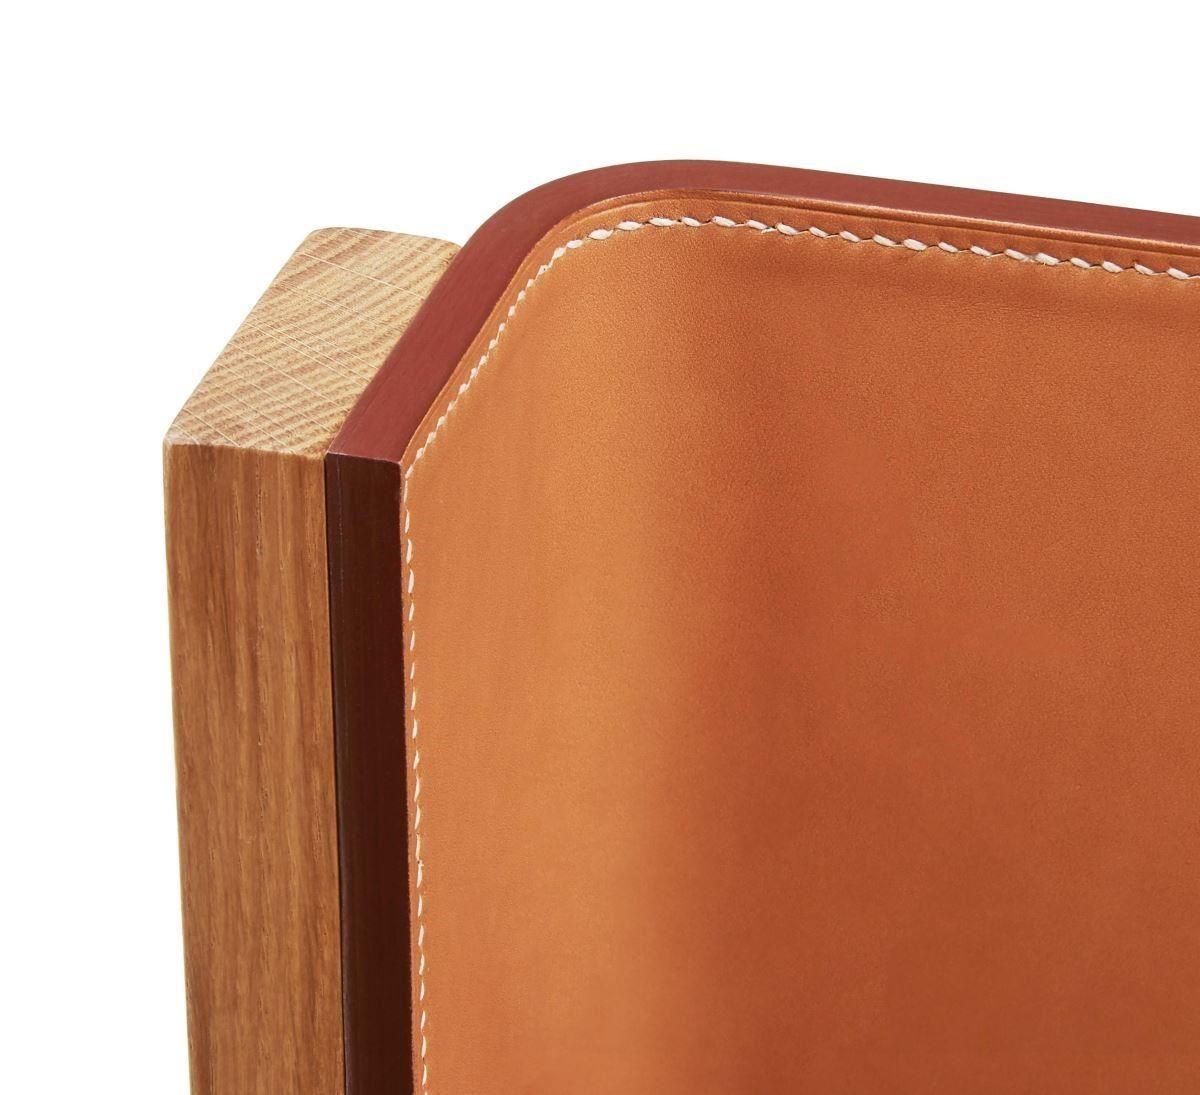 EQUIS D'HERMÈS 系列家具,椅背和座椅是採用愛馬仕專業的皮革工藝手工縫製,再由木頭托架相連,是極為困難的技術。